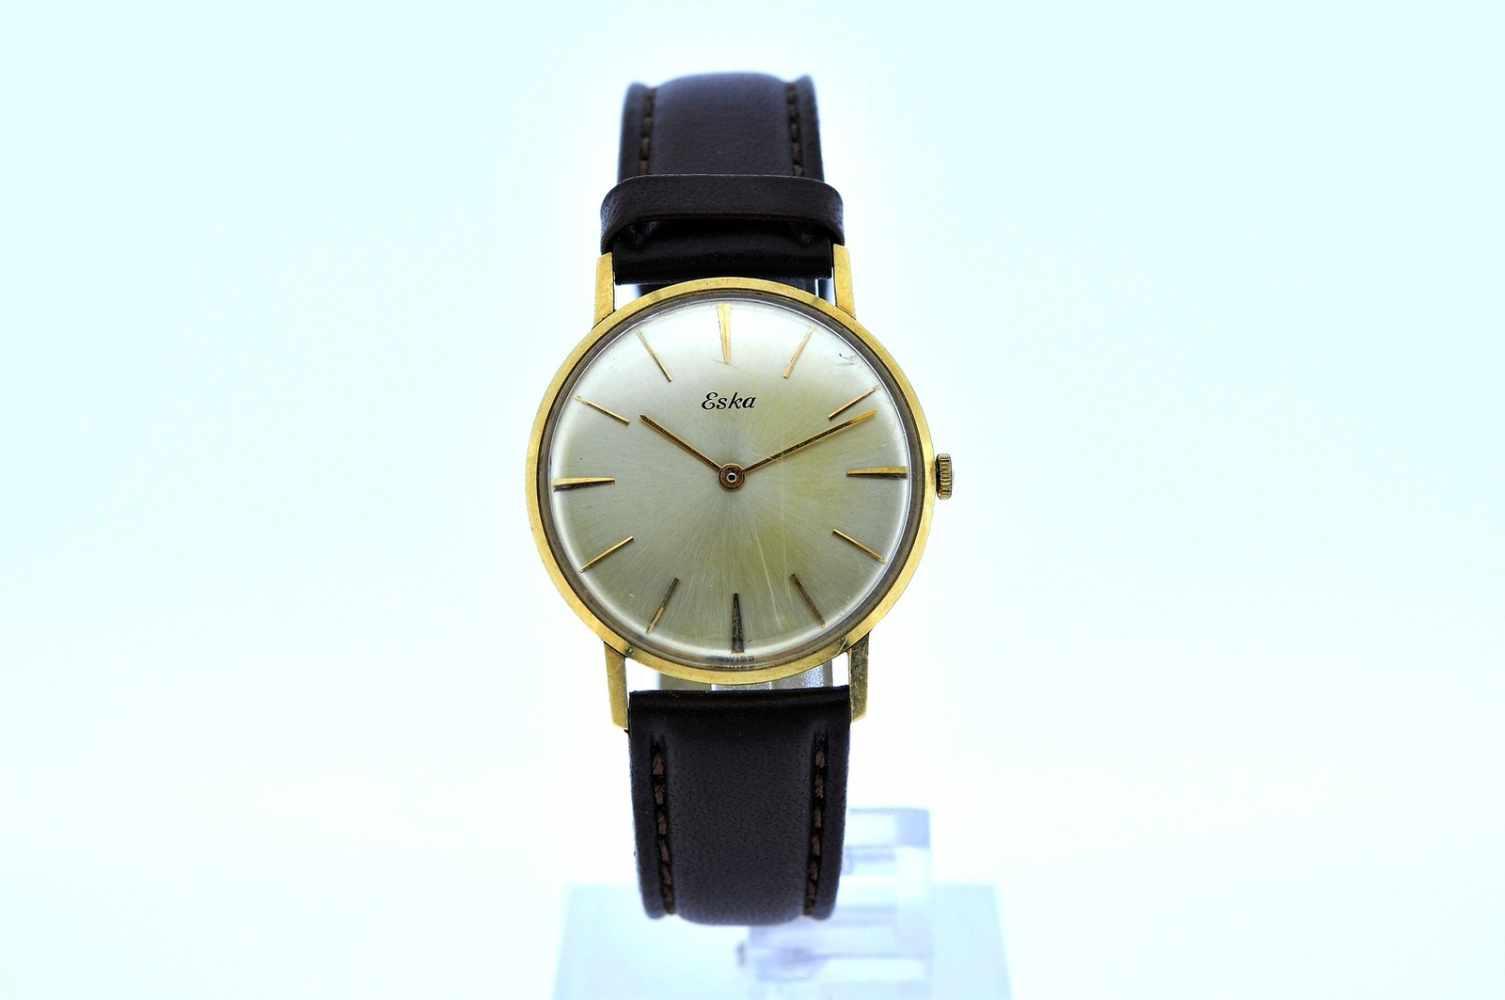 Eska Goldene Armbanduhr an Lederband, Eska, Handaufzug, Ankerwerk, Werkservice empfohlen, 28,1 g. - Bild 2 aus 6